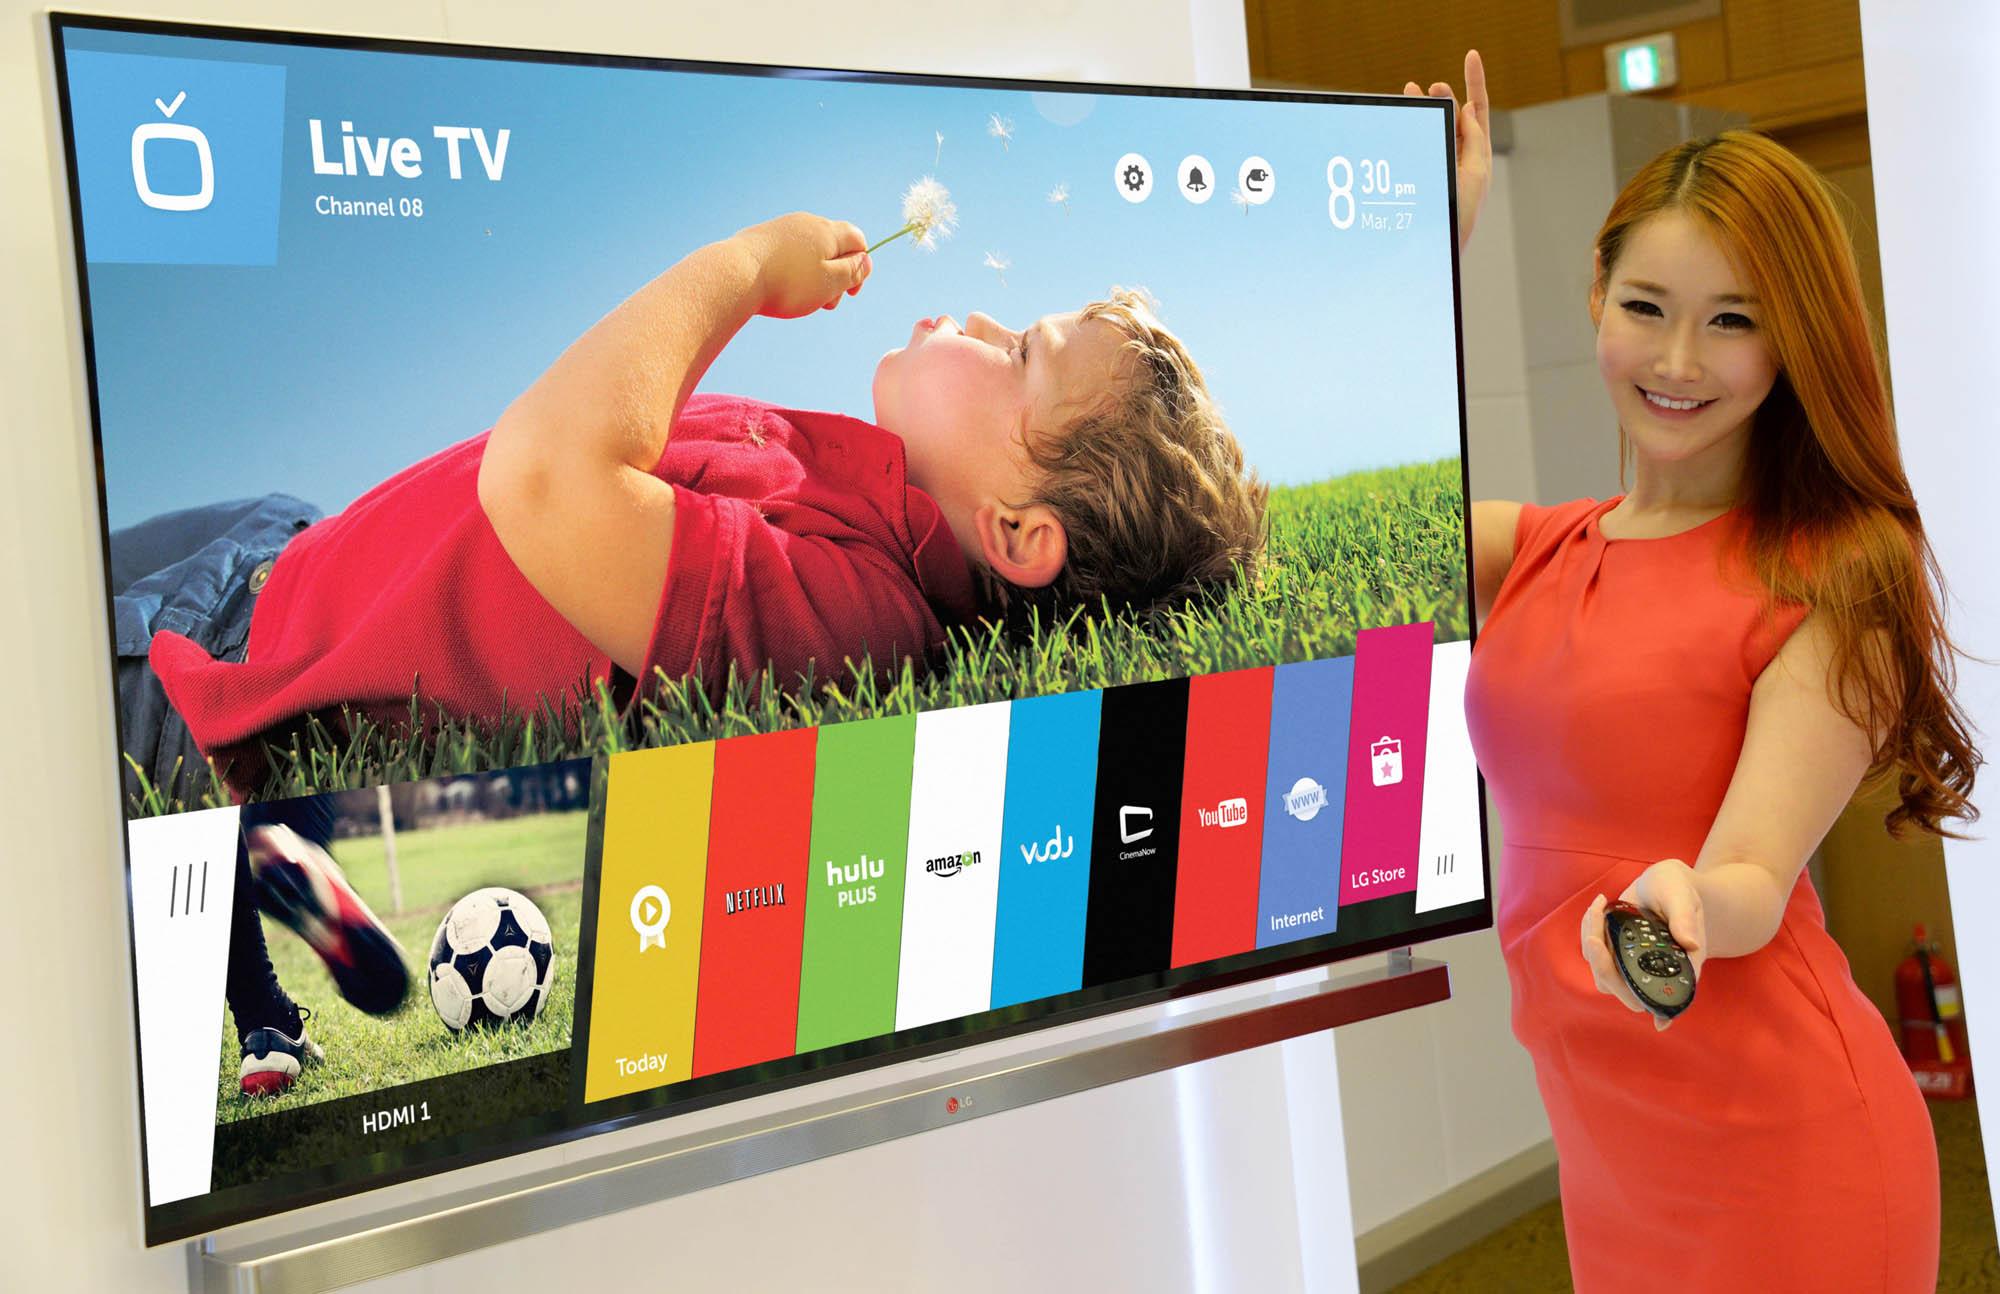 LG MAKES SMART TV SIMPLE WITH NEW WEBOS SMART TV PLATFORM | LG Newsroom